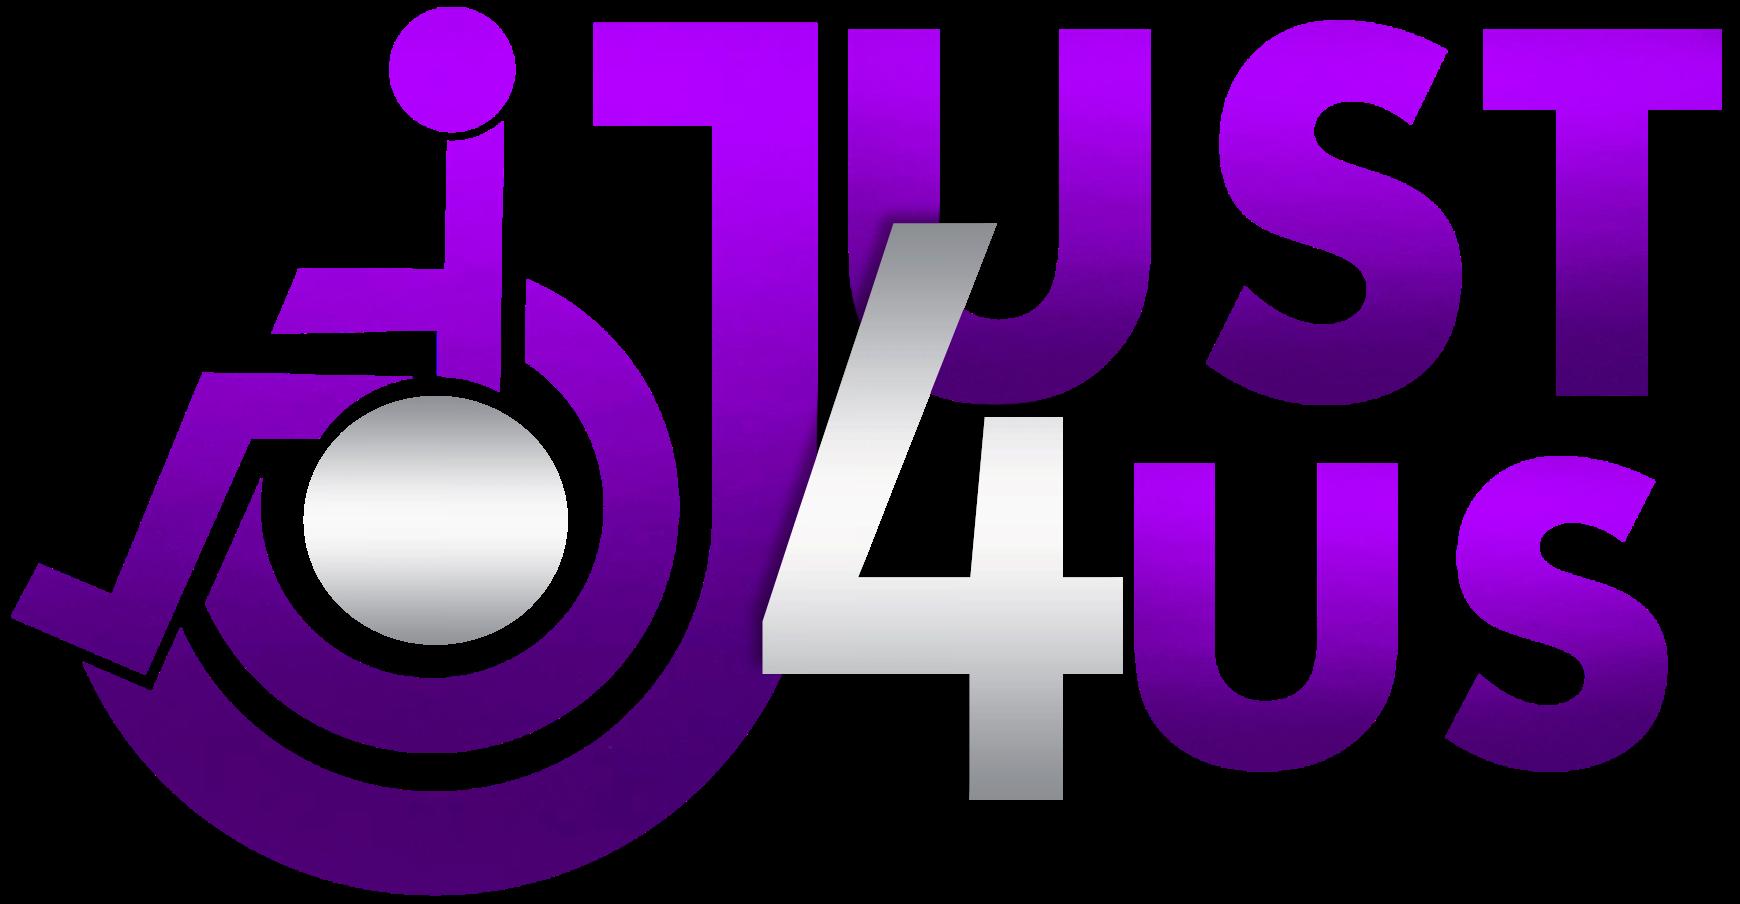 Just 4 Us Foundation Inc.